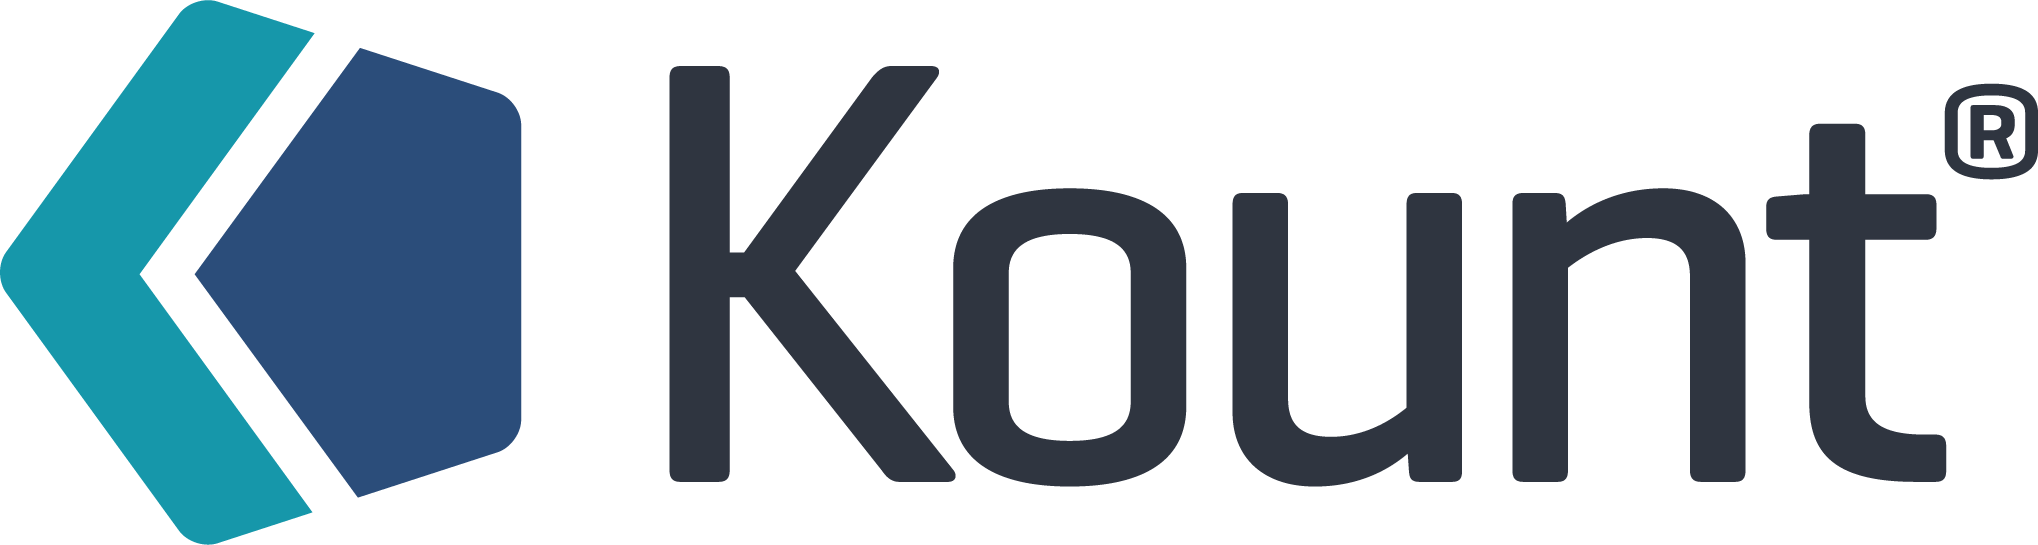 kount logo.png